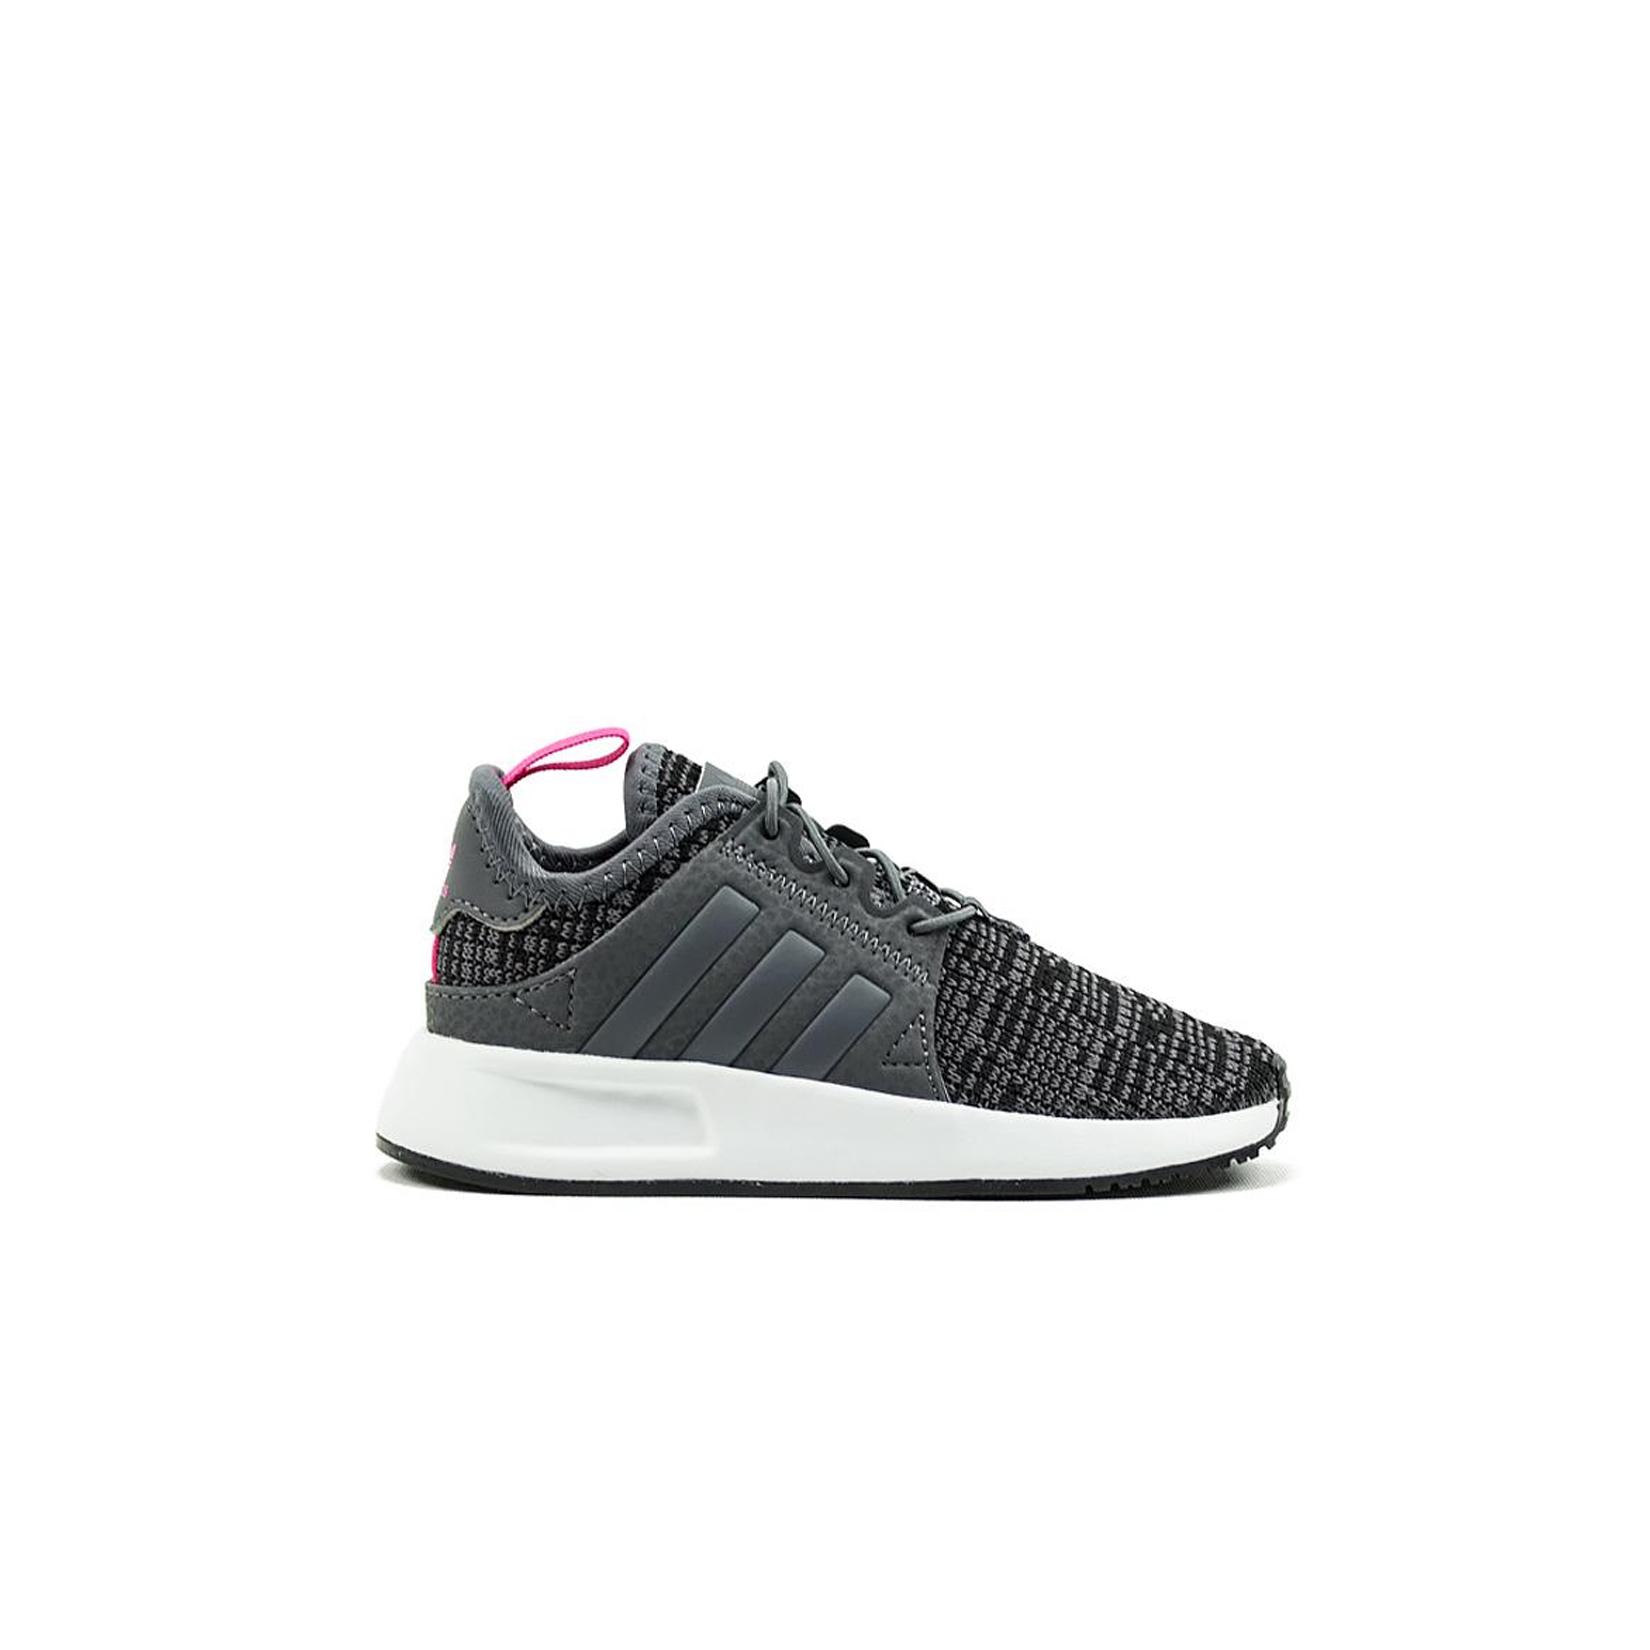 Baby Shoes Adidas Originals X_PLR Grey Pink | All Sports.gr  liefert